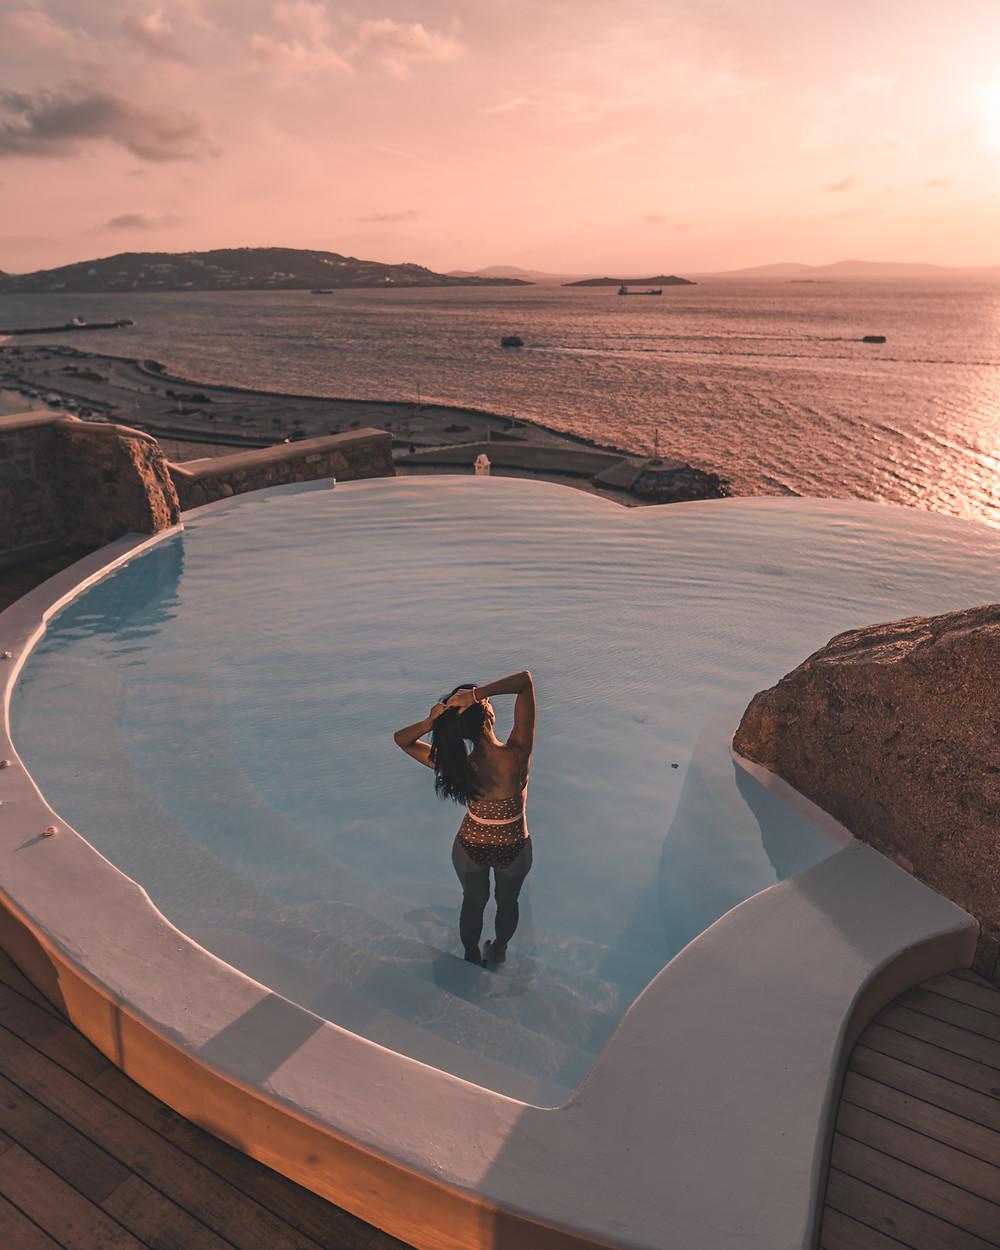 Cavo Tagoo, Mykonos, Greece